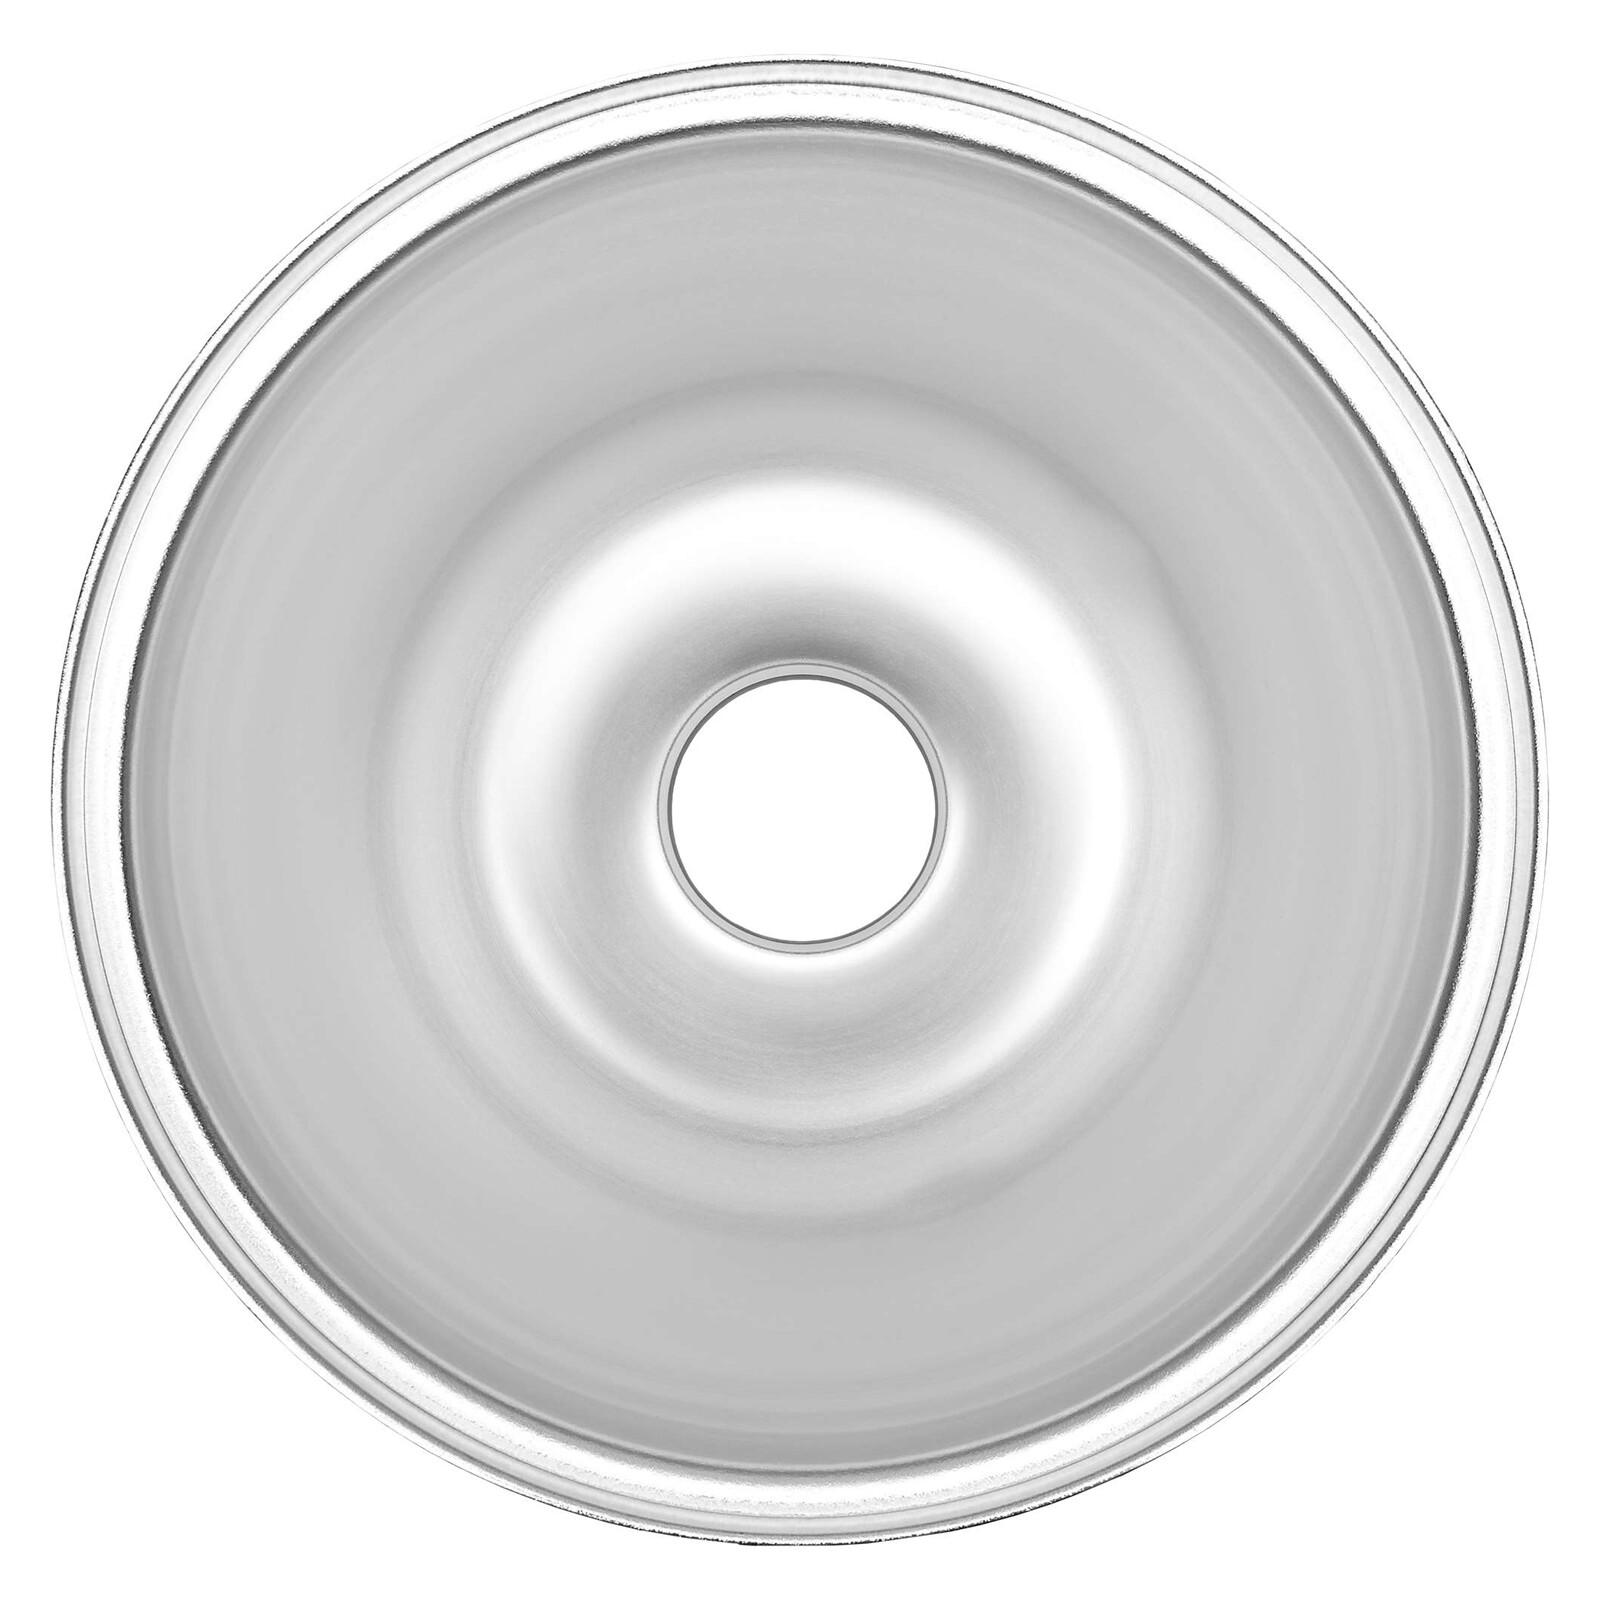 Profoto Tele Zoom Reflector